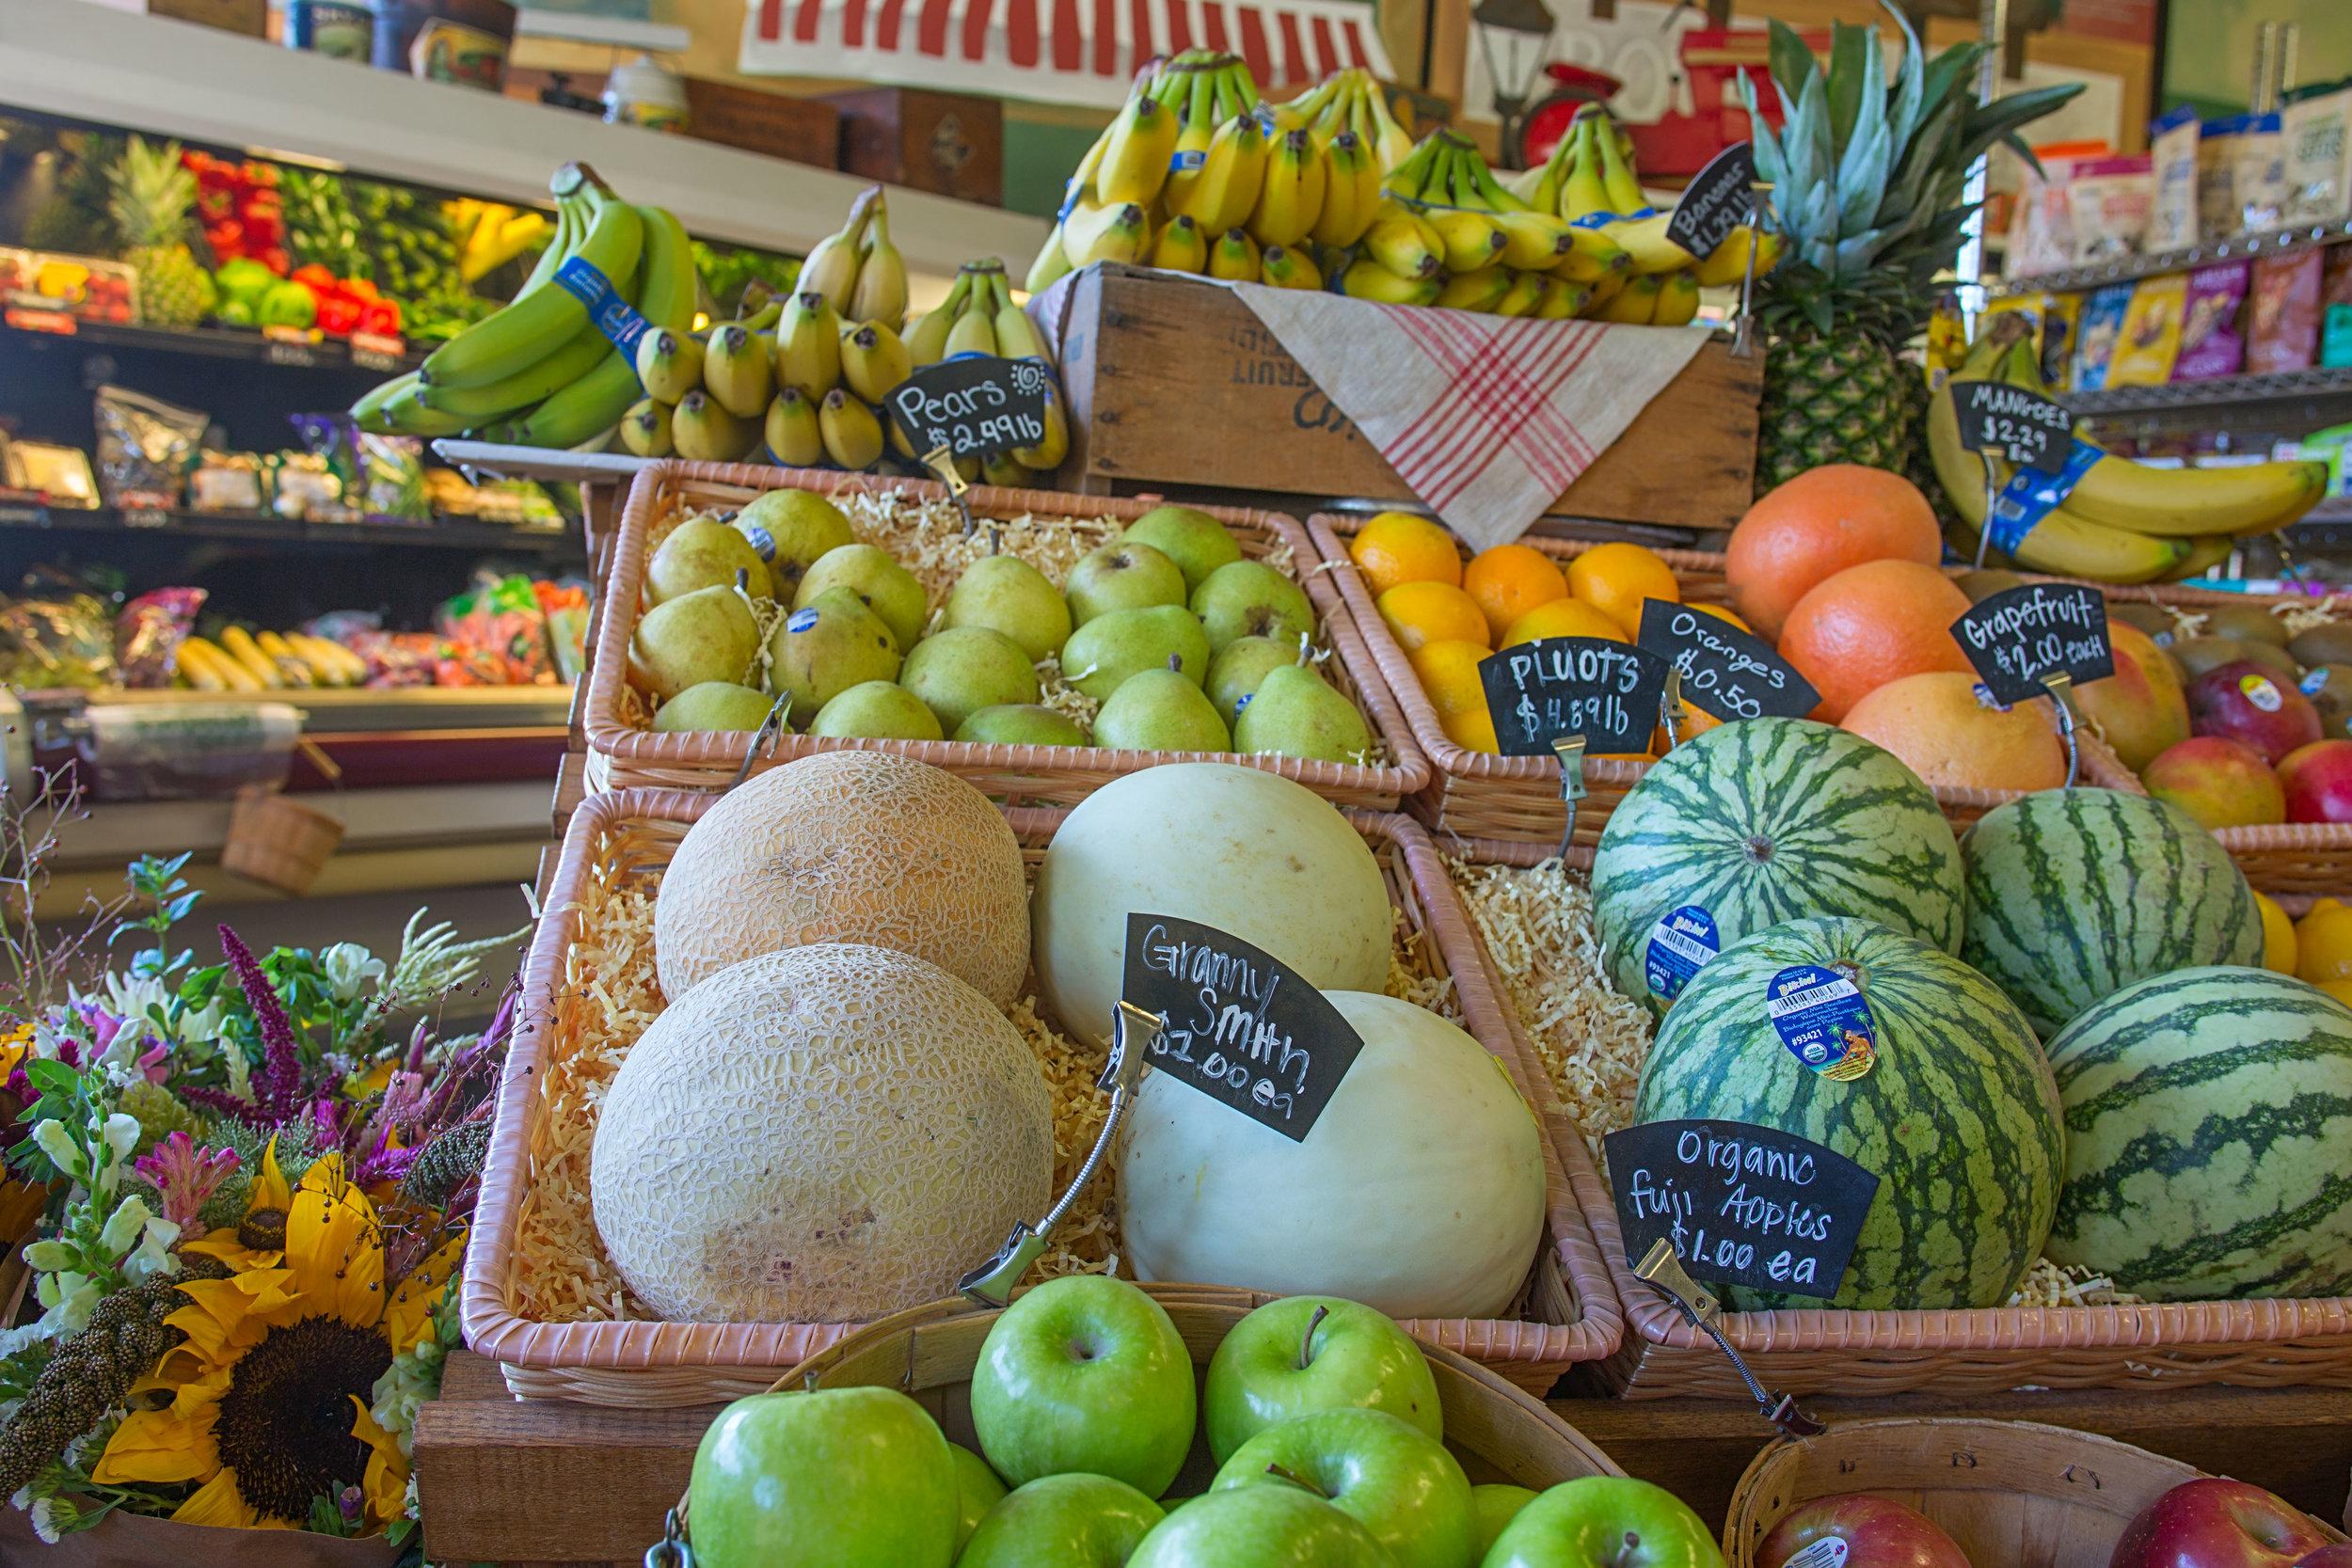 produce variety 1.jpg